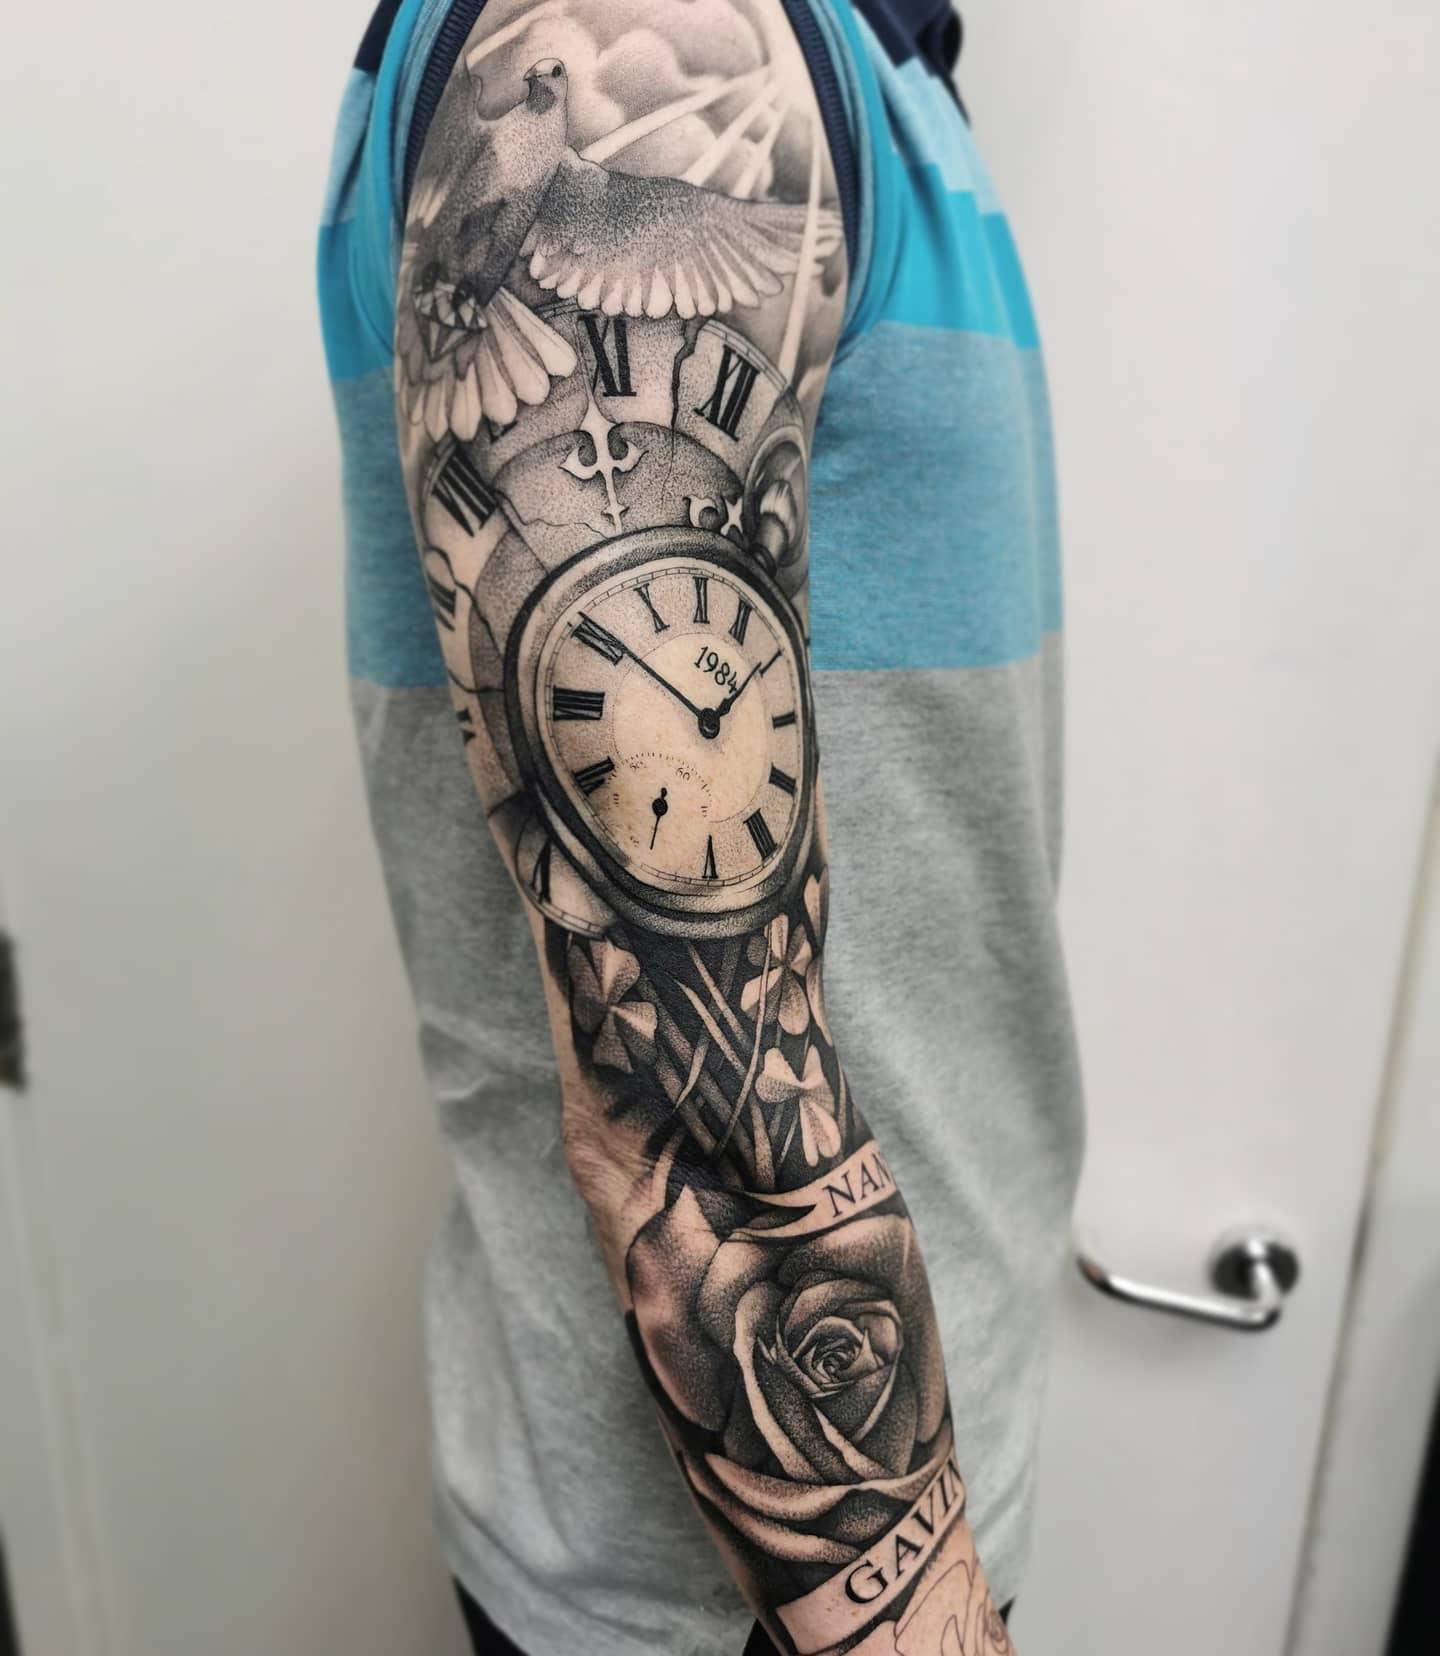 Nice progress on this B&G Classic _________________________________ pocketwatch classic tattoo artdriven stencilstuff edinburghtattooartist studioxiii silverbackink btattooing onlythedarkest tattooartist tattooartistuk edinburgh ink tattoos inked tattooed picoftheday art love pic photooftheday photo blackandgrey blackngrey instagram artist design tattooer